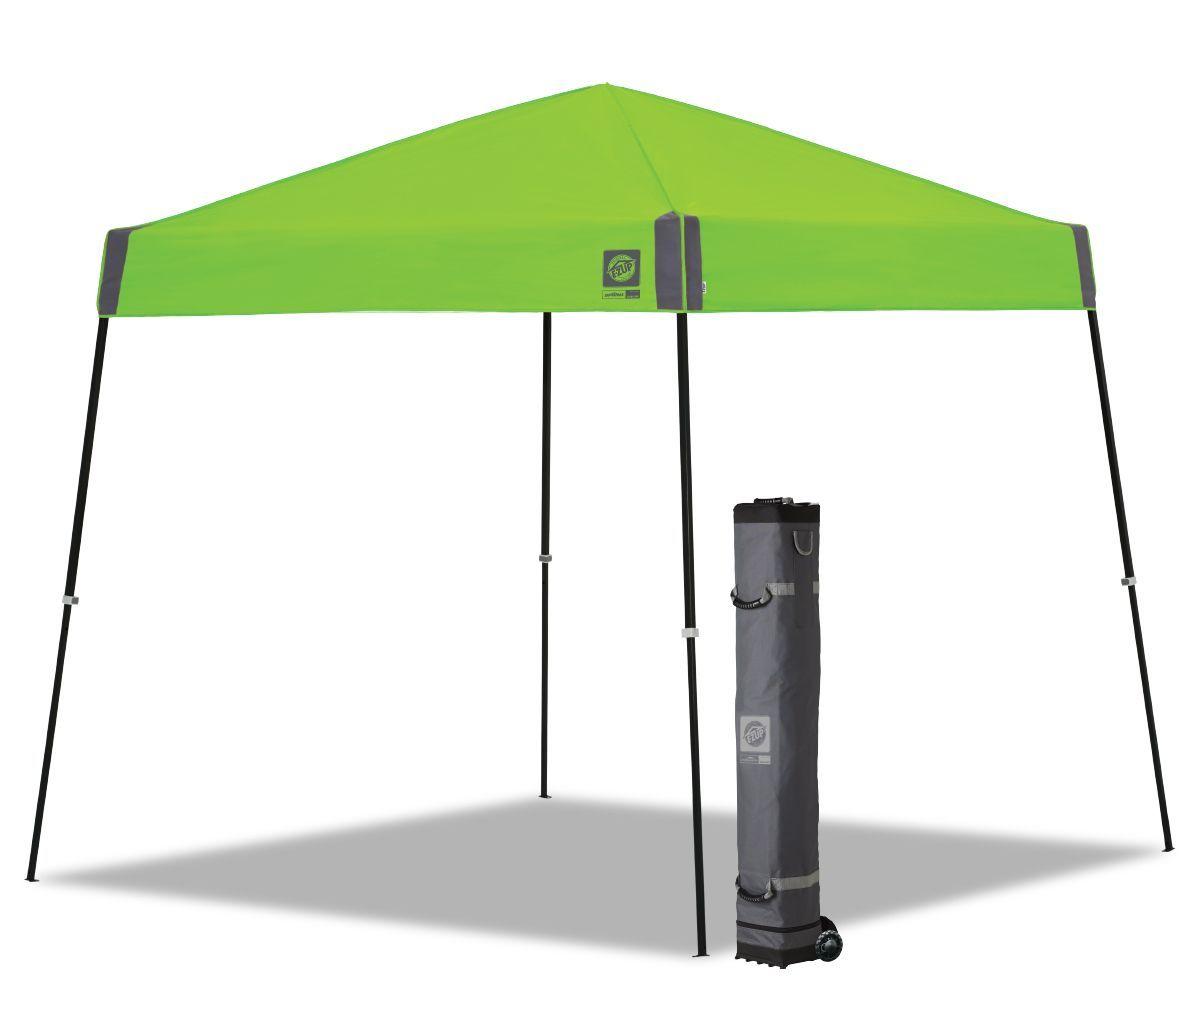 E-Z UP SPRINT 10'x10' Kiwi Top Black Frame Recreational Canopy EzUp Ez Up Ez-Up - $150.99